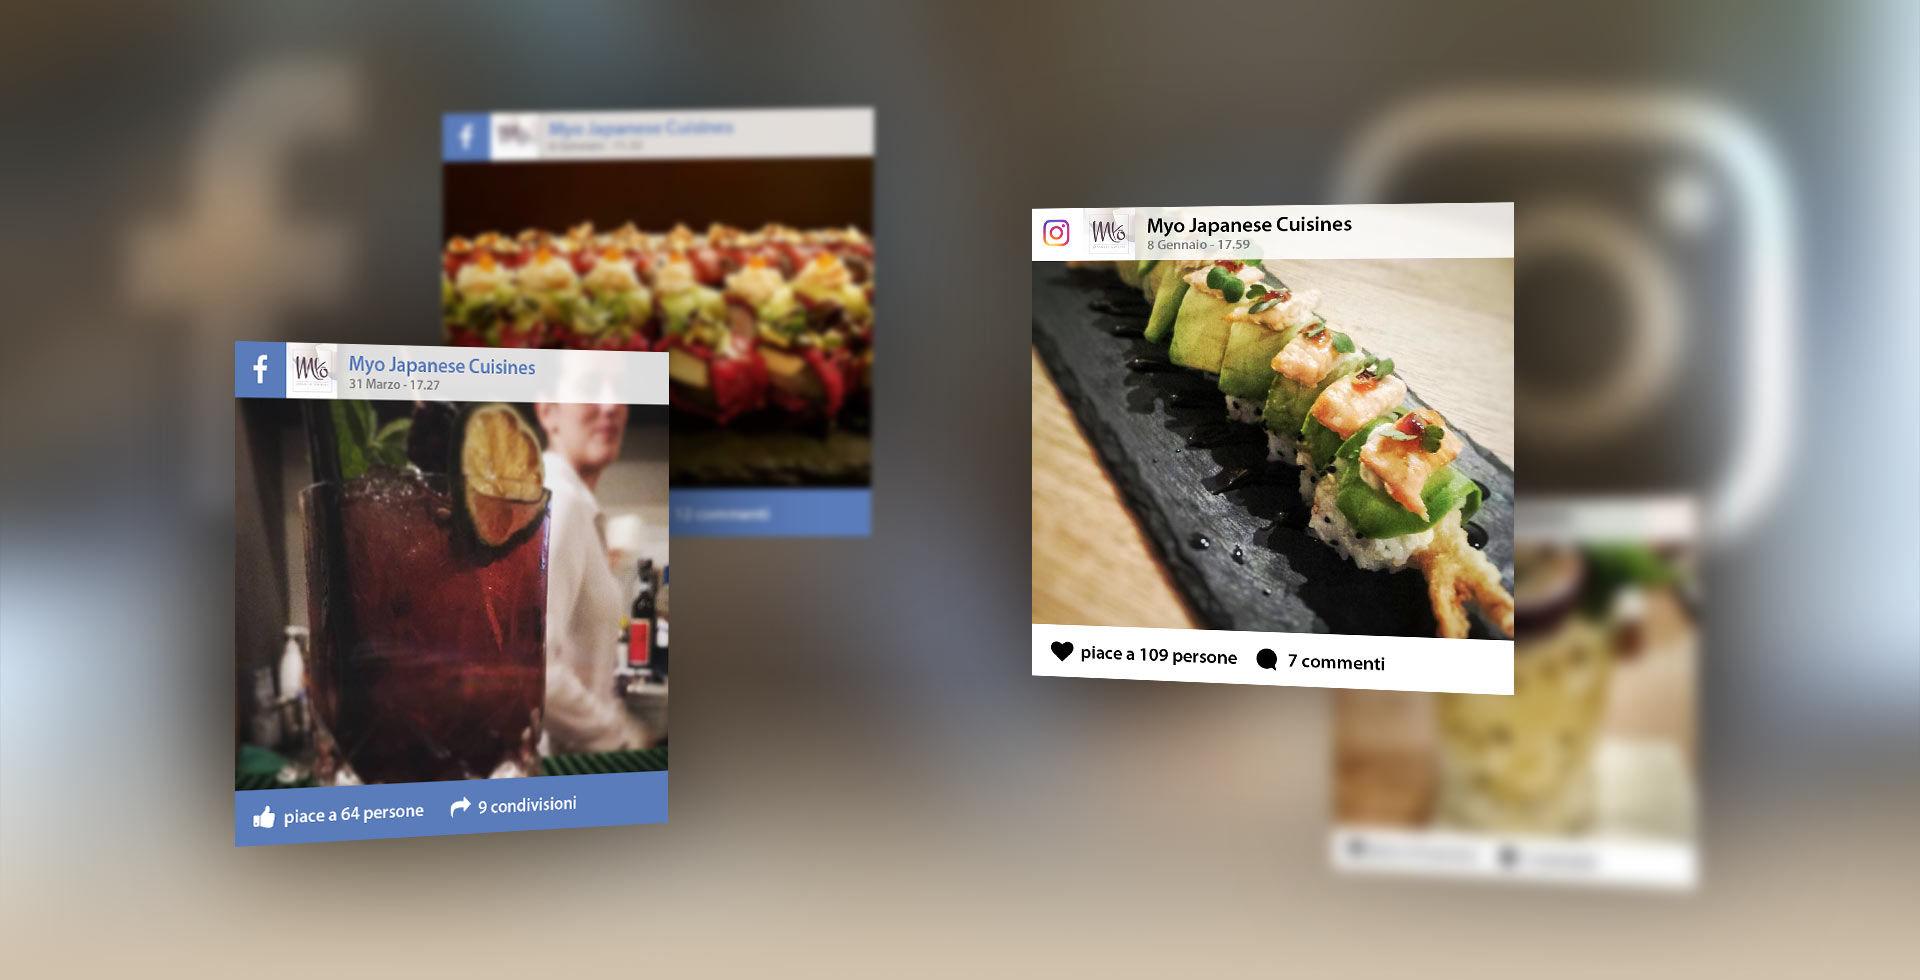 Gestione social media Myo Japanese Cuisine